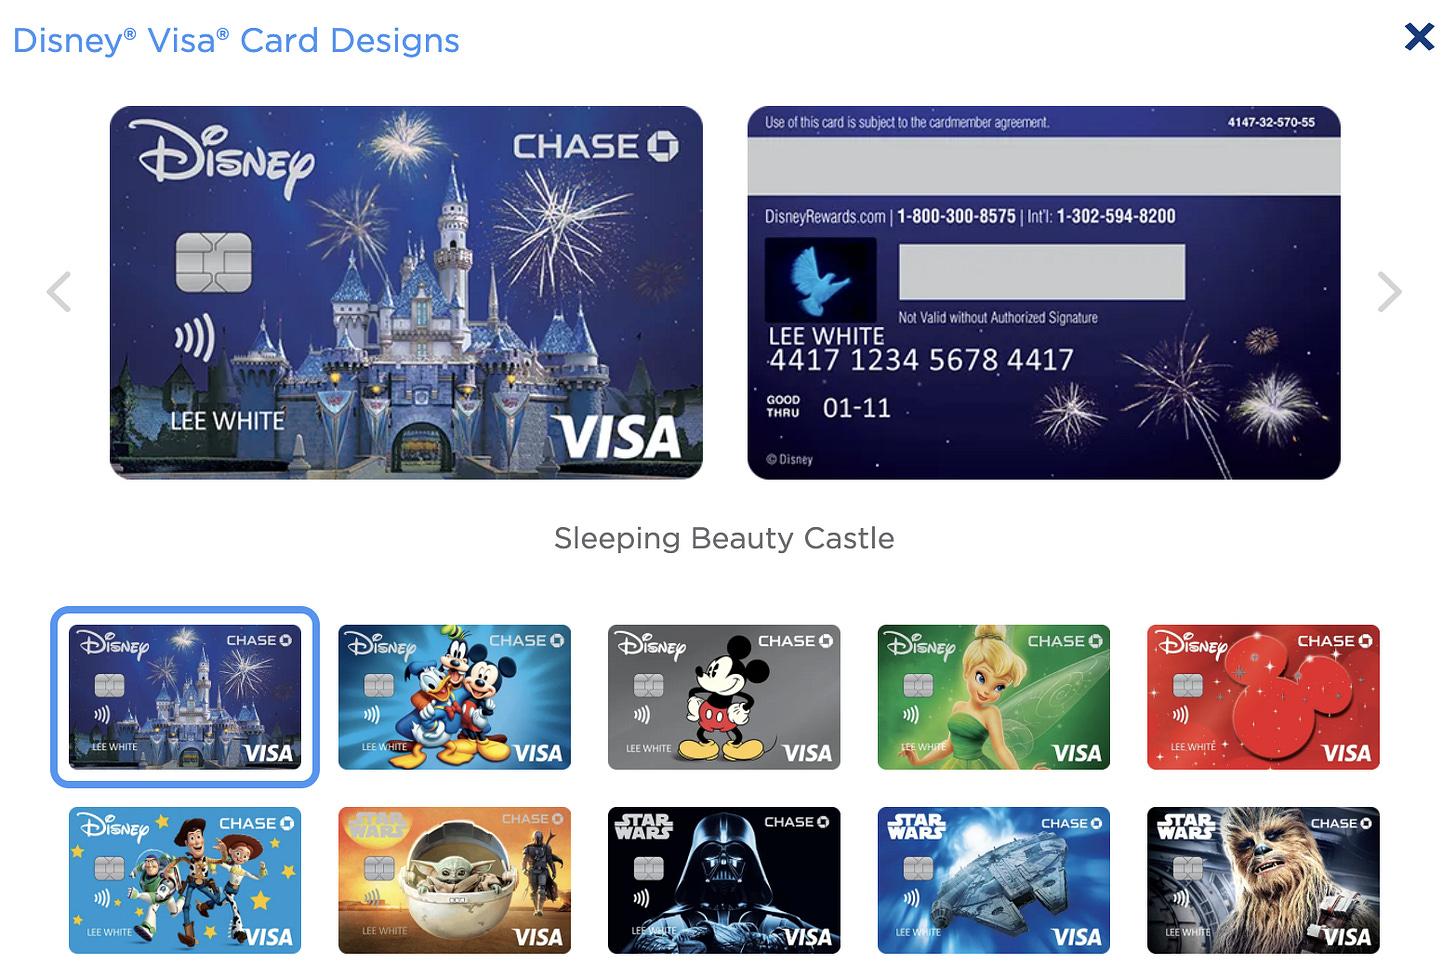 So many choices of Disney cards